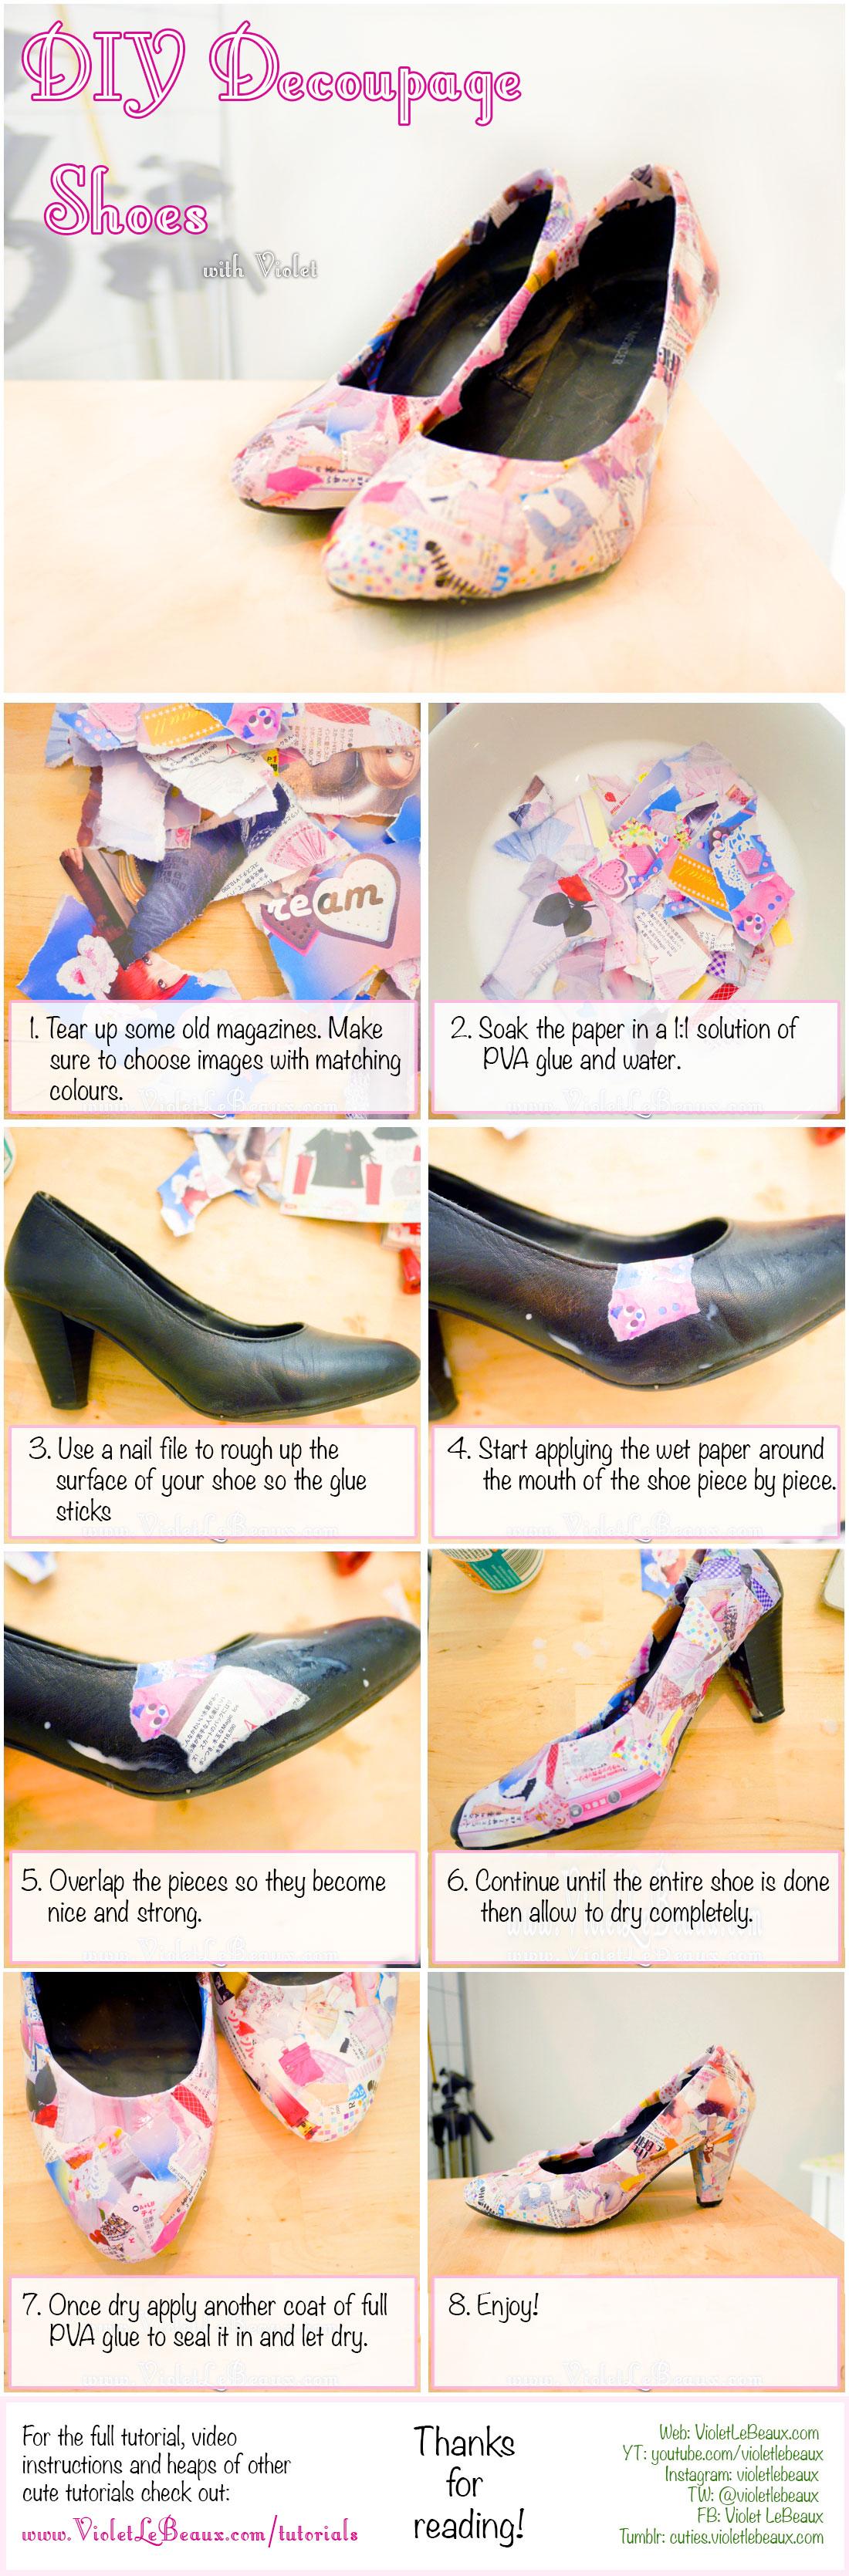 How To DIY Decoupage Shoes! Tutorial | Decoupage shoes ...